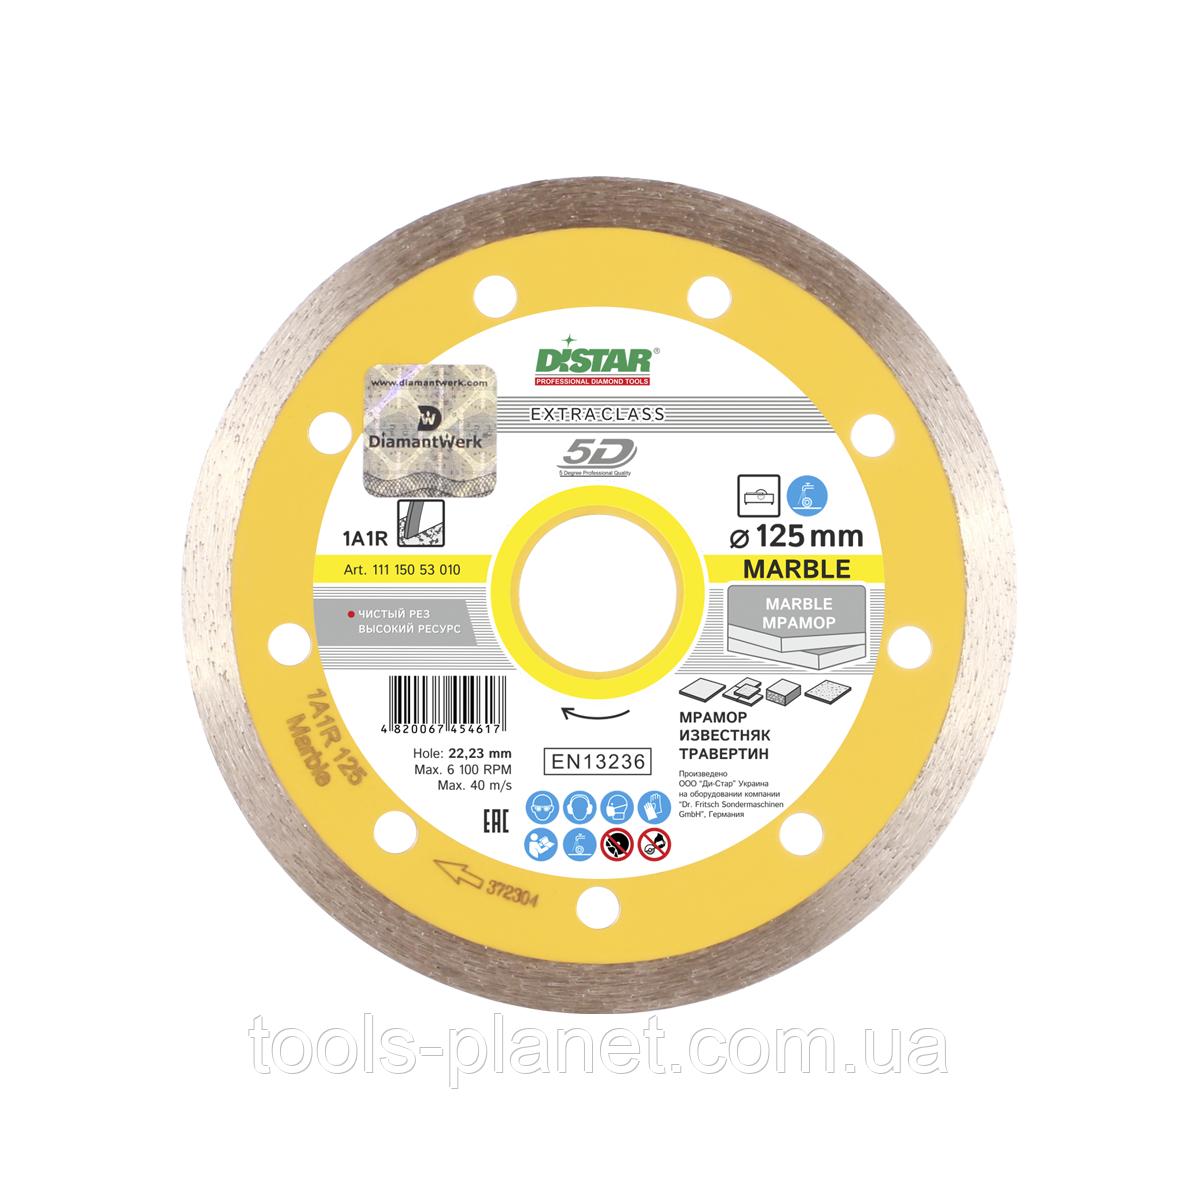 Алмазный диск Distar 1A1R 150 x 1,4 x 8 x 22,23 Marble 5D (11115053012)